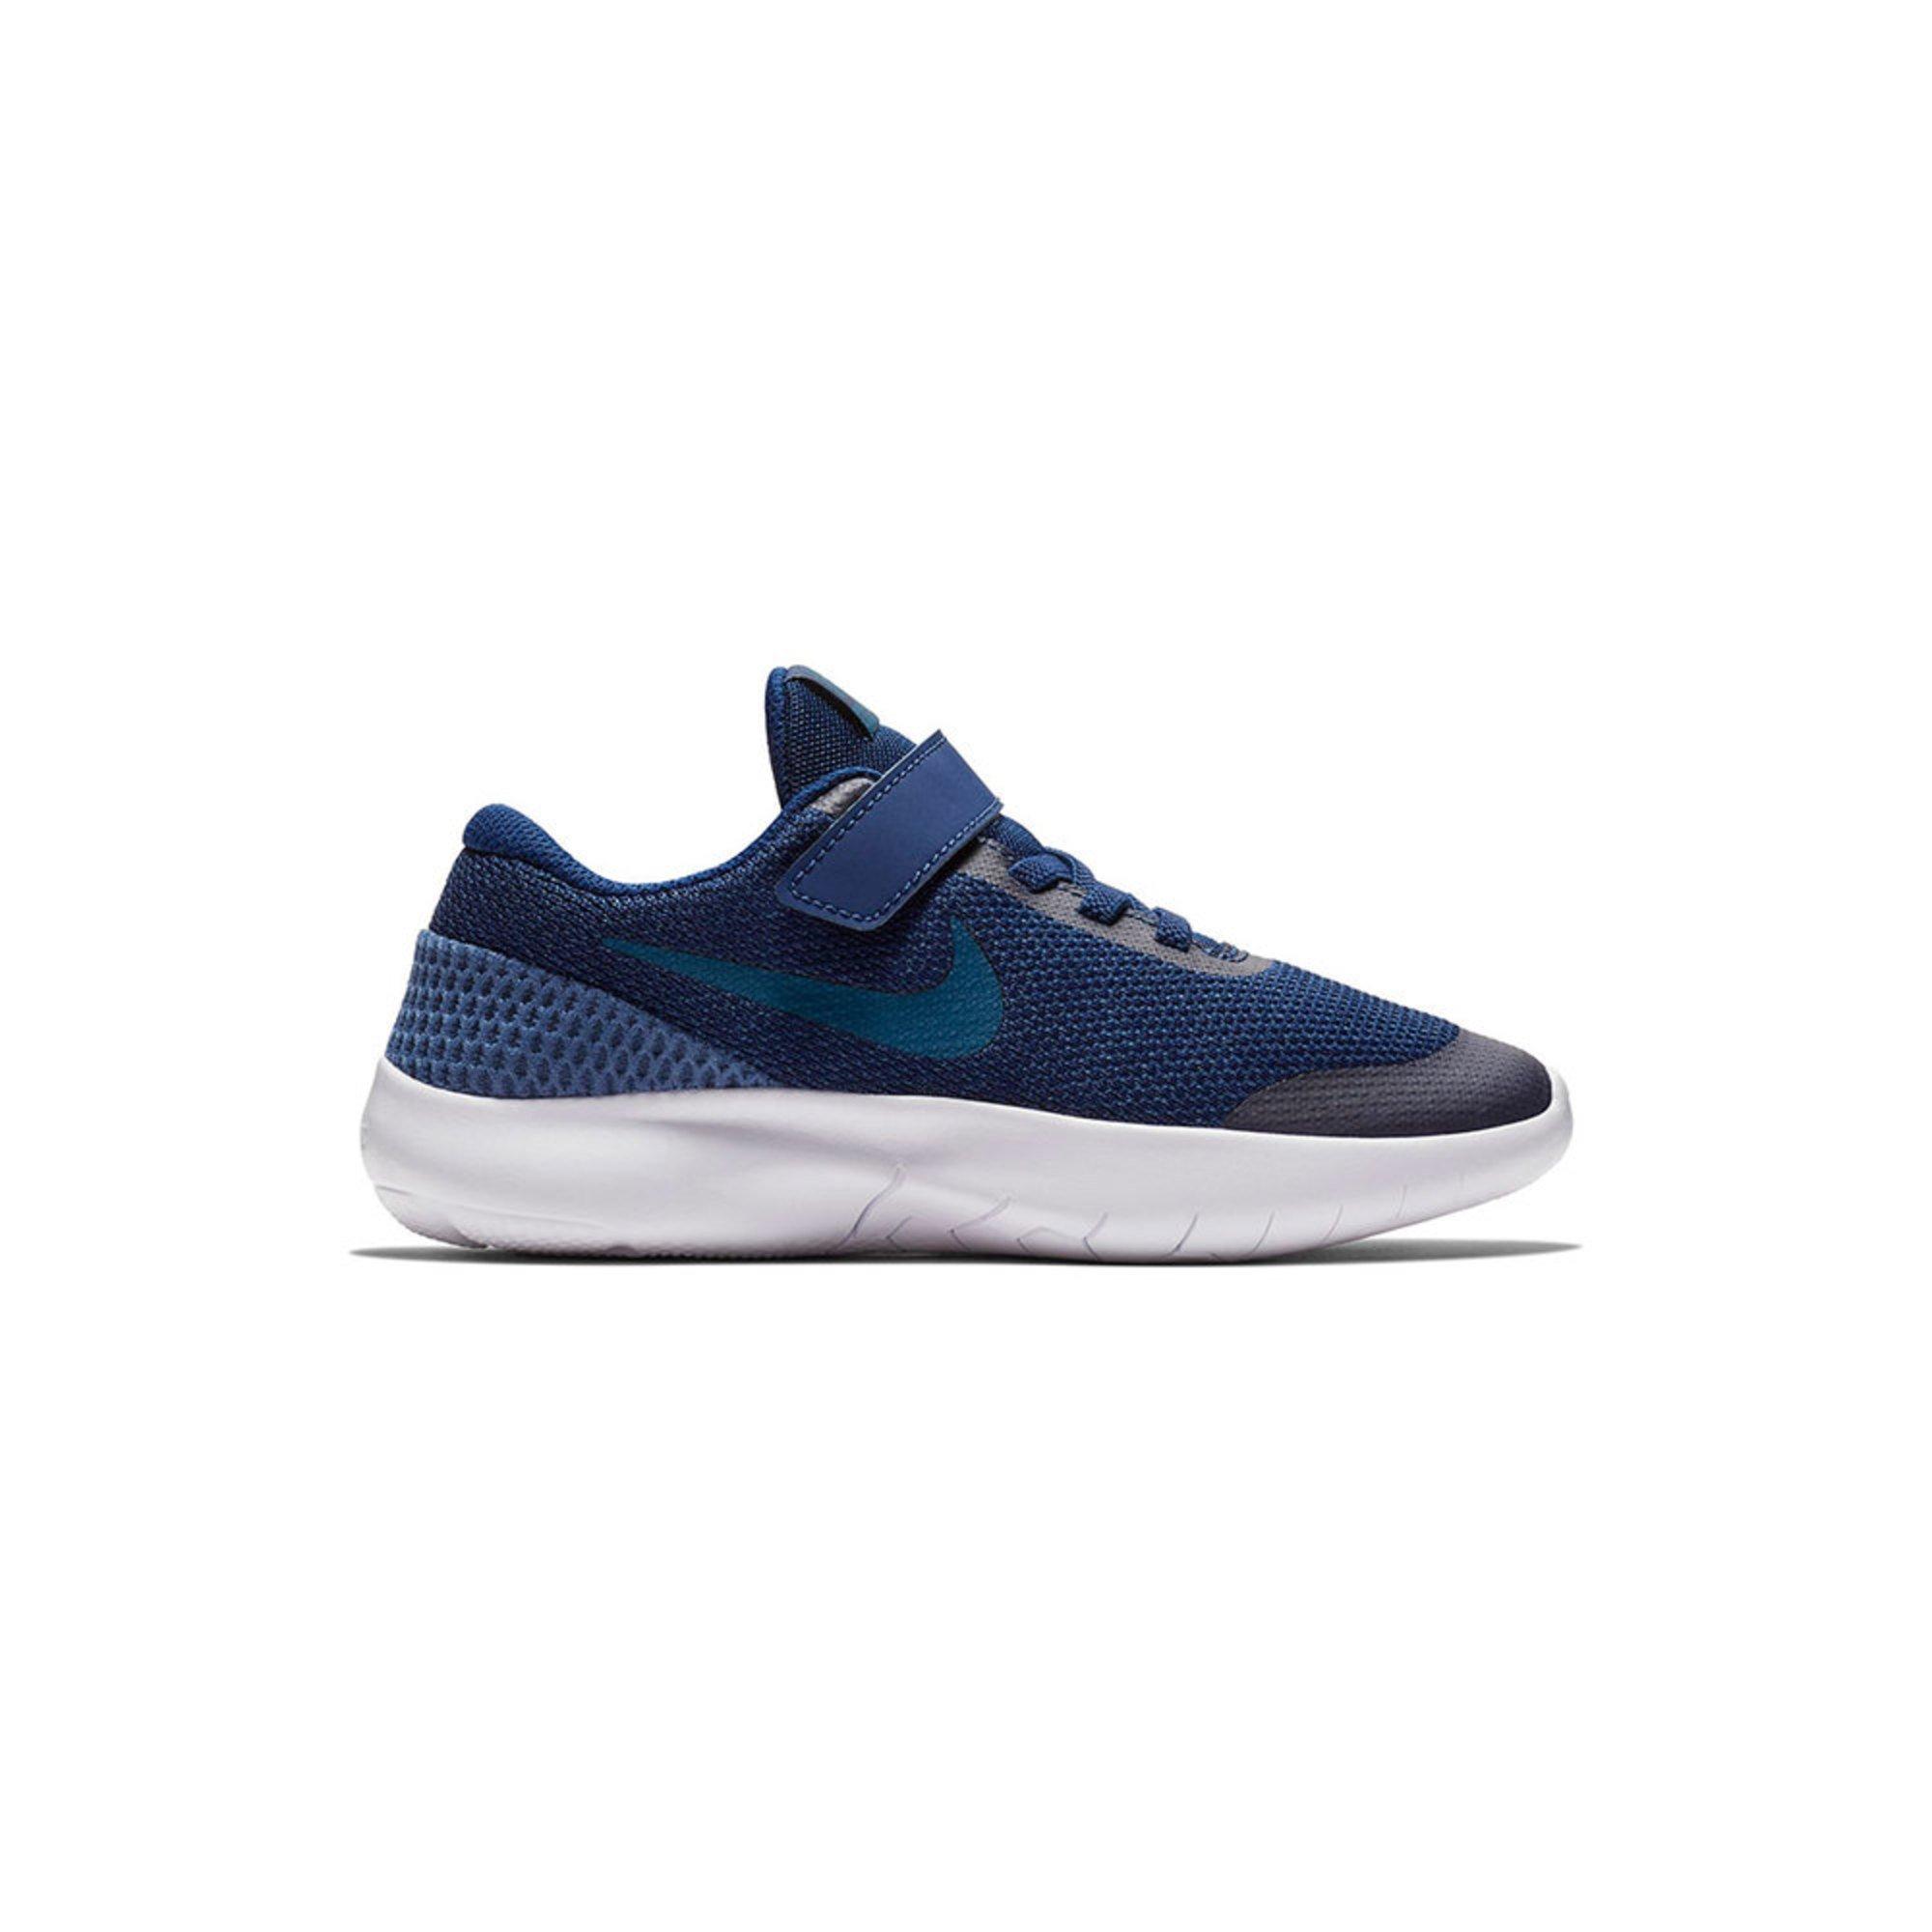 632527e9f7e9 Nike. Nike Boys Flex Experience RN 7 Running Shoe (Little Kid)